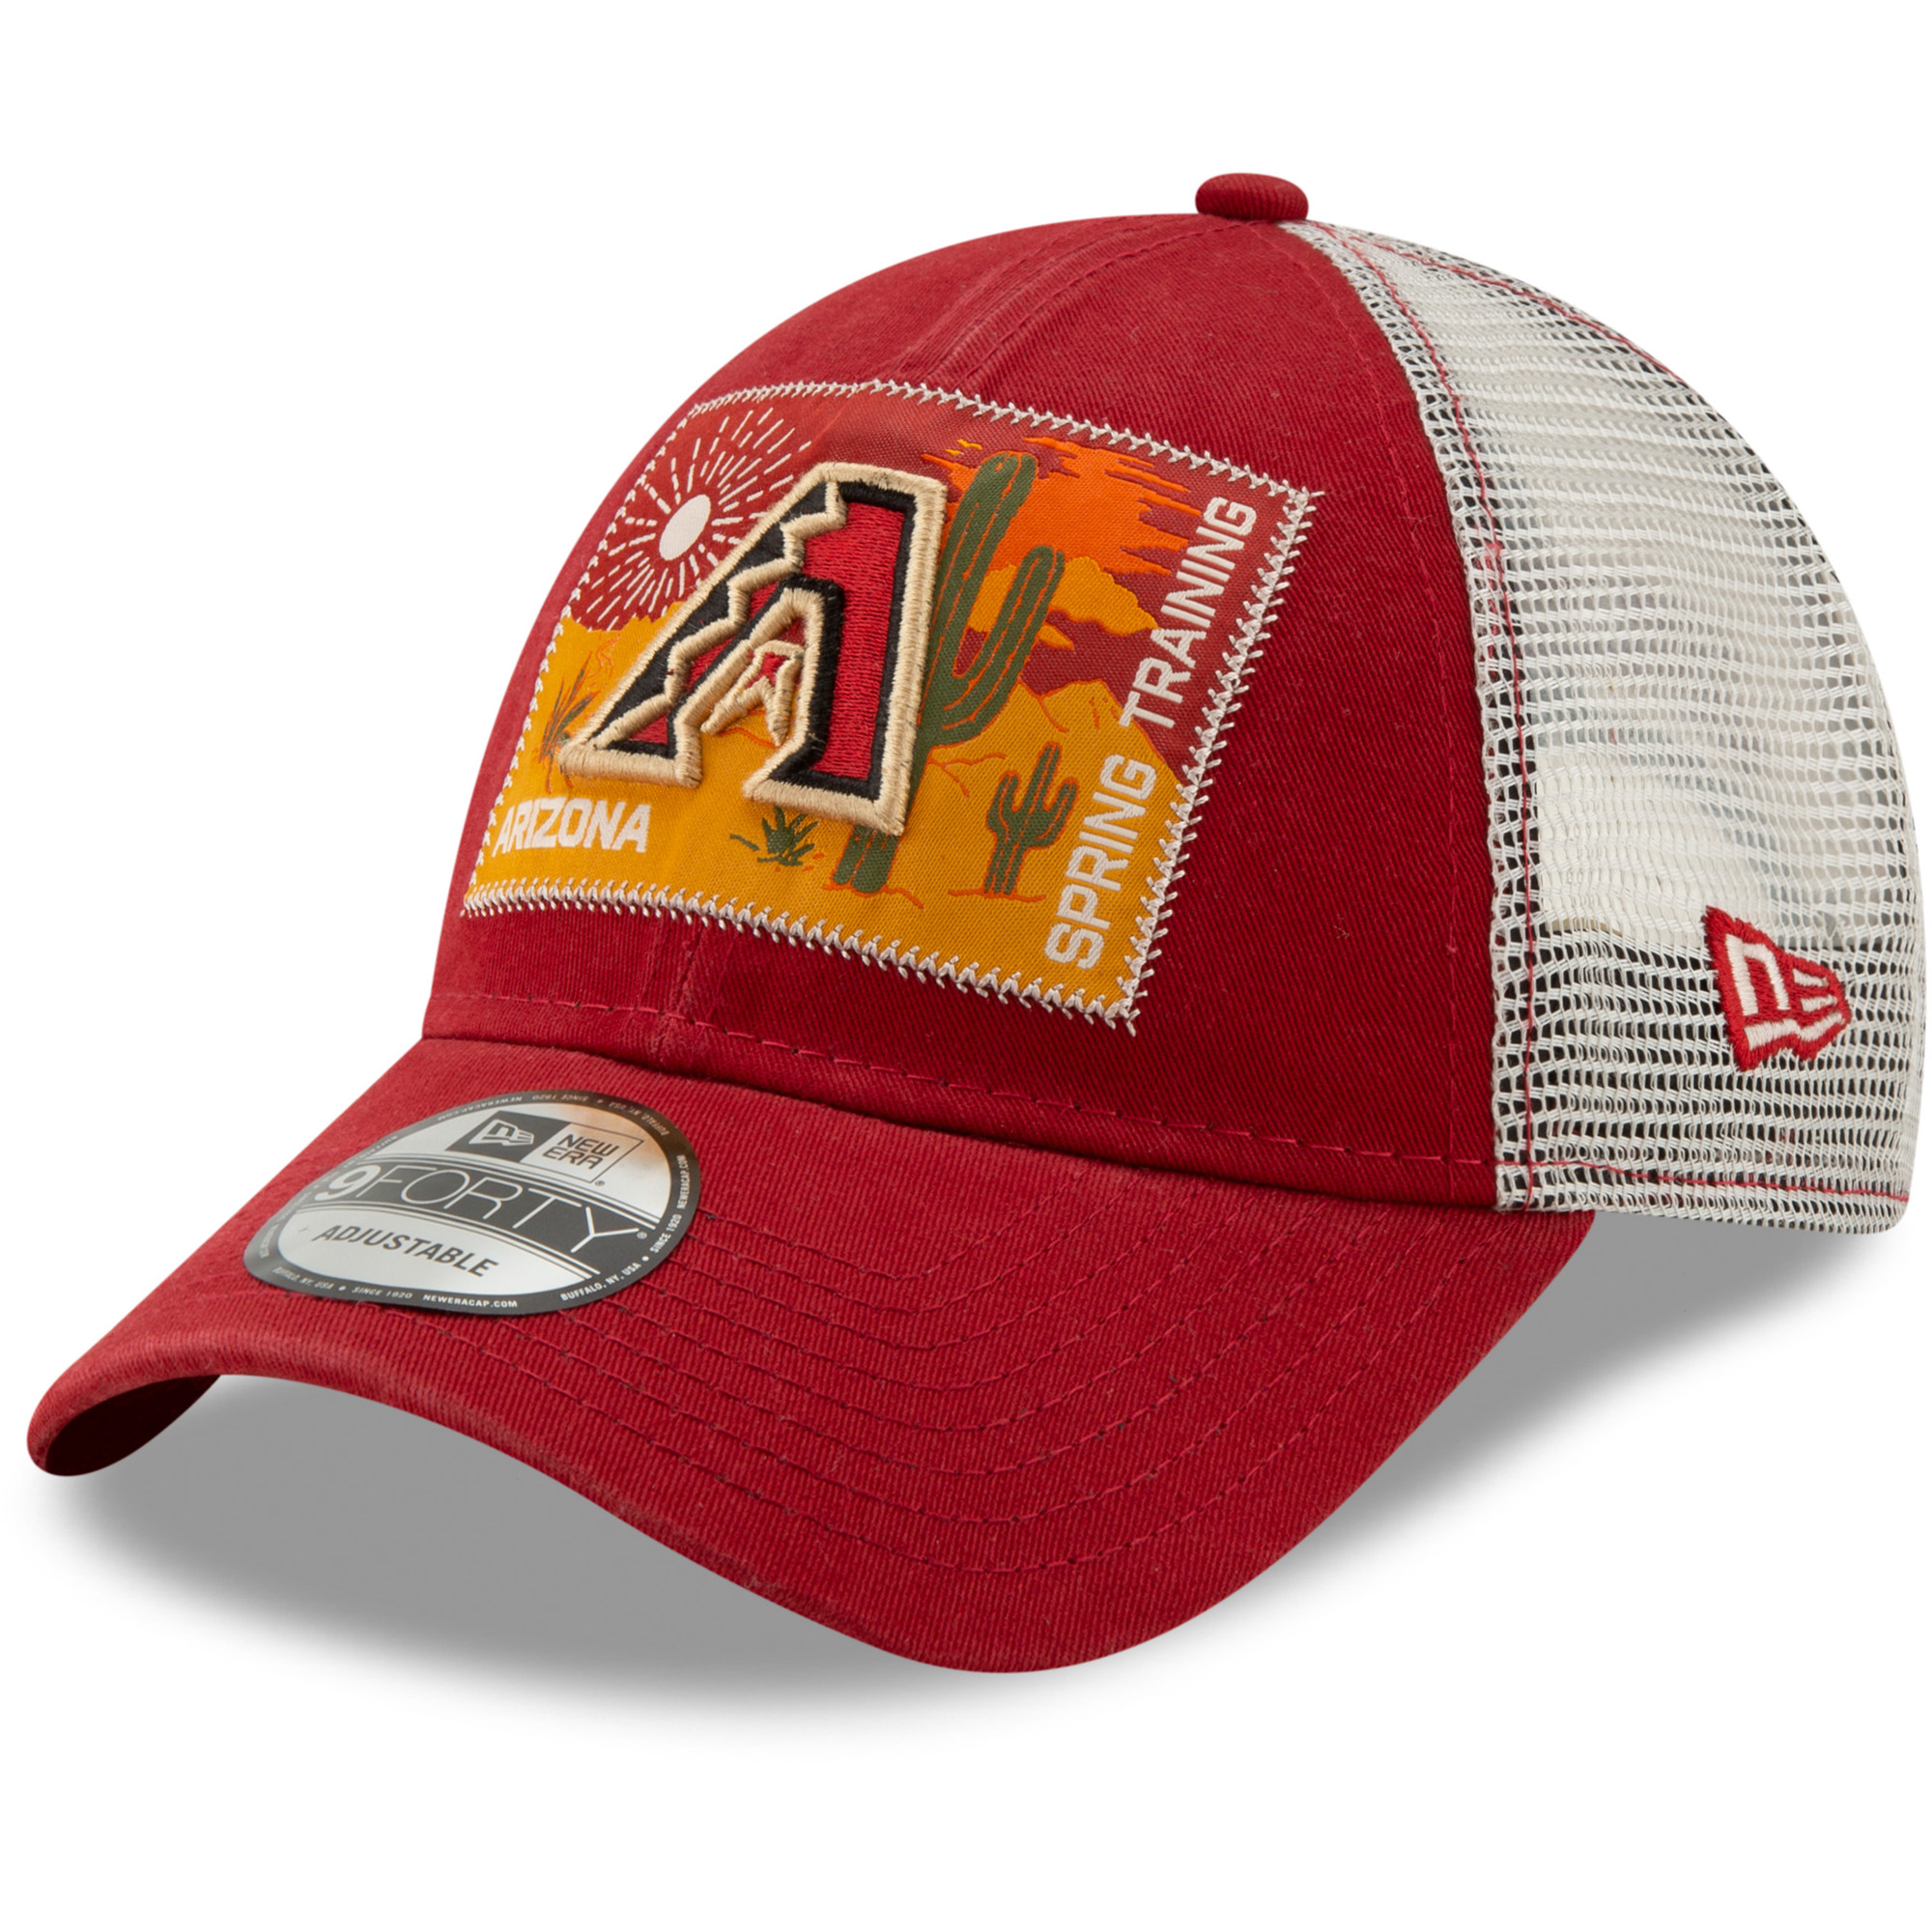 Arizona Diamondbacks New Era Patched Trucker 3 9FORTY Adjustable Snapback Hat - Red/White - OSFA